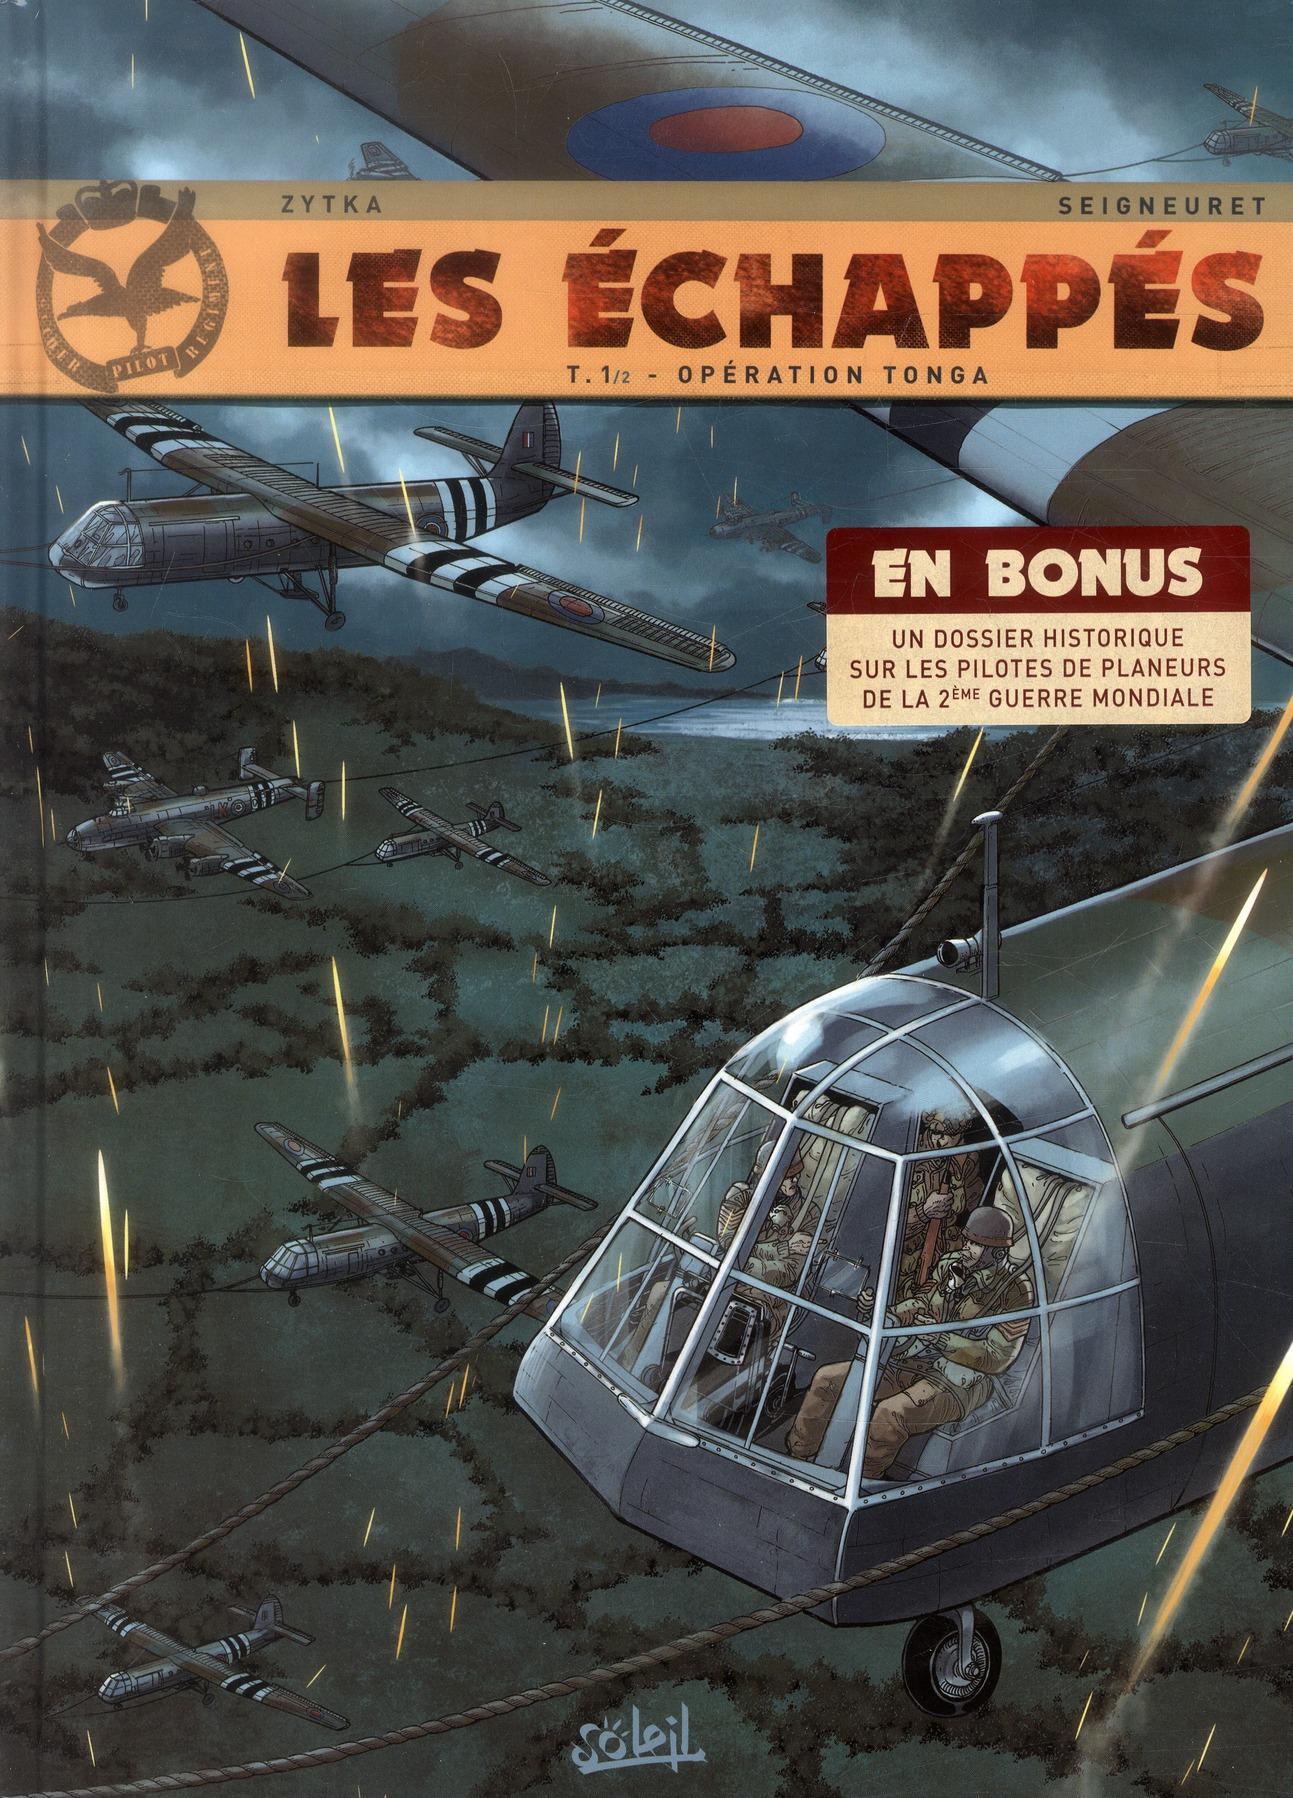 LES ECHAPPES T1 - OPERATION TONGA